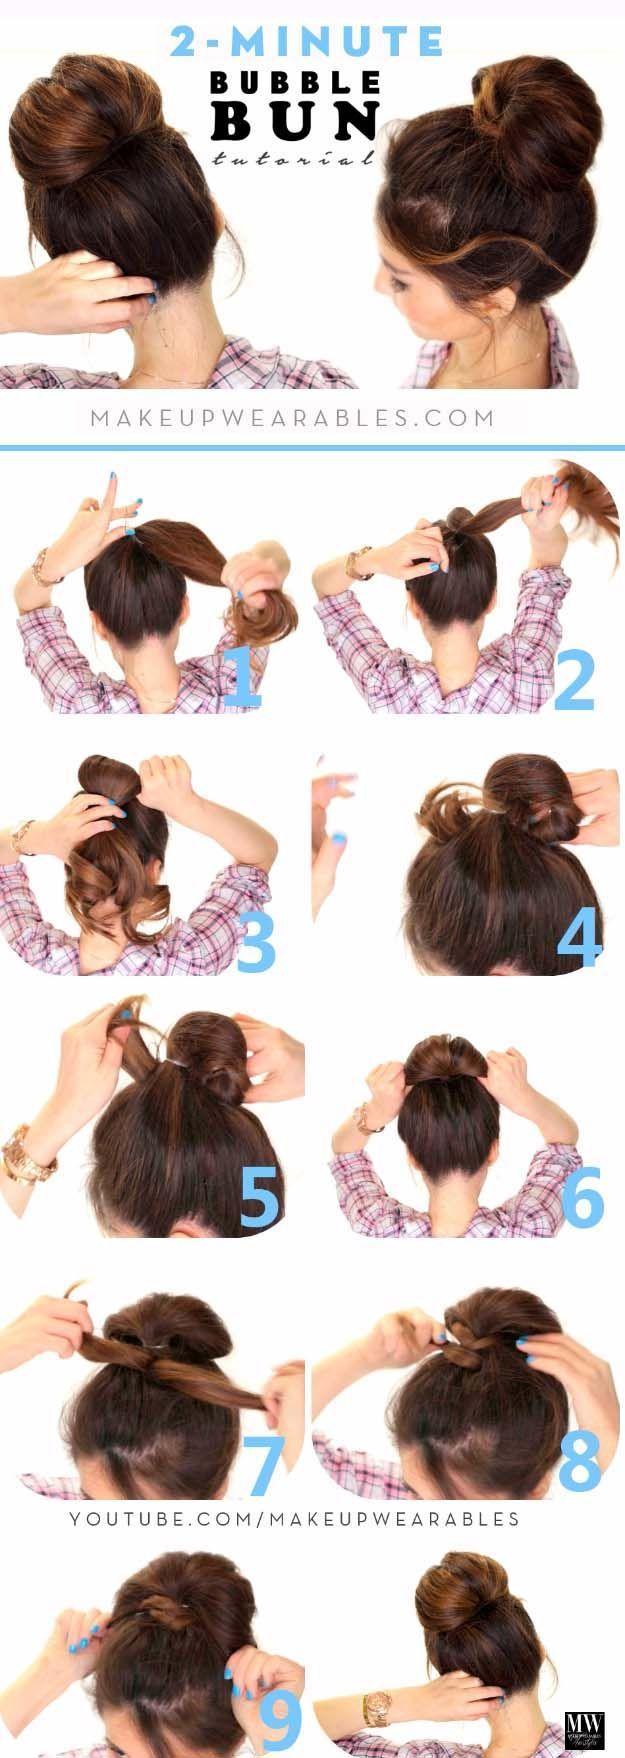 11 Best Long Hair Styles A cute messy bun for when #Bun #chill